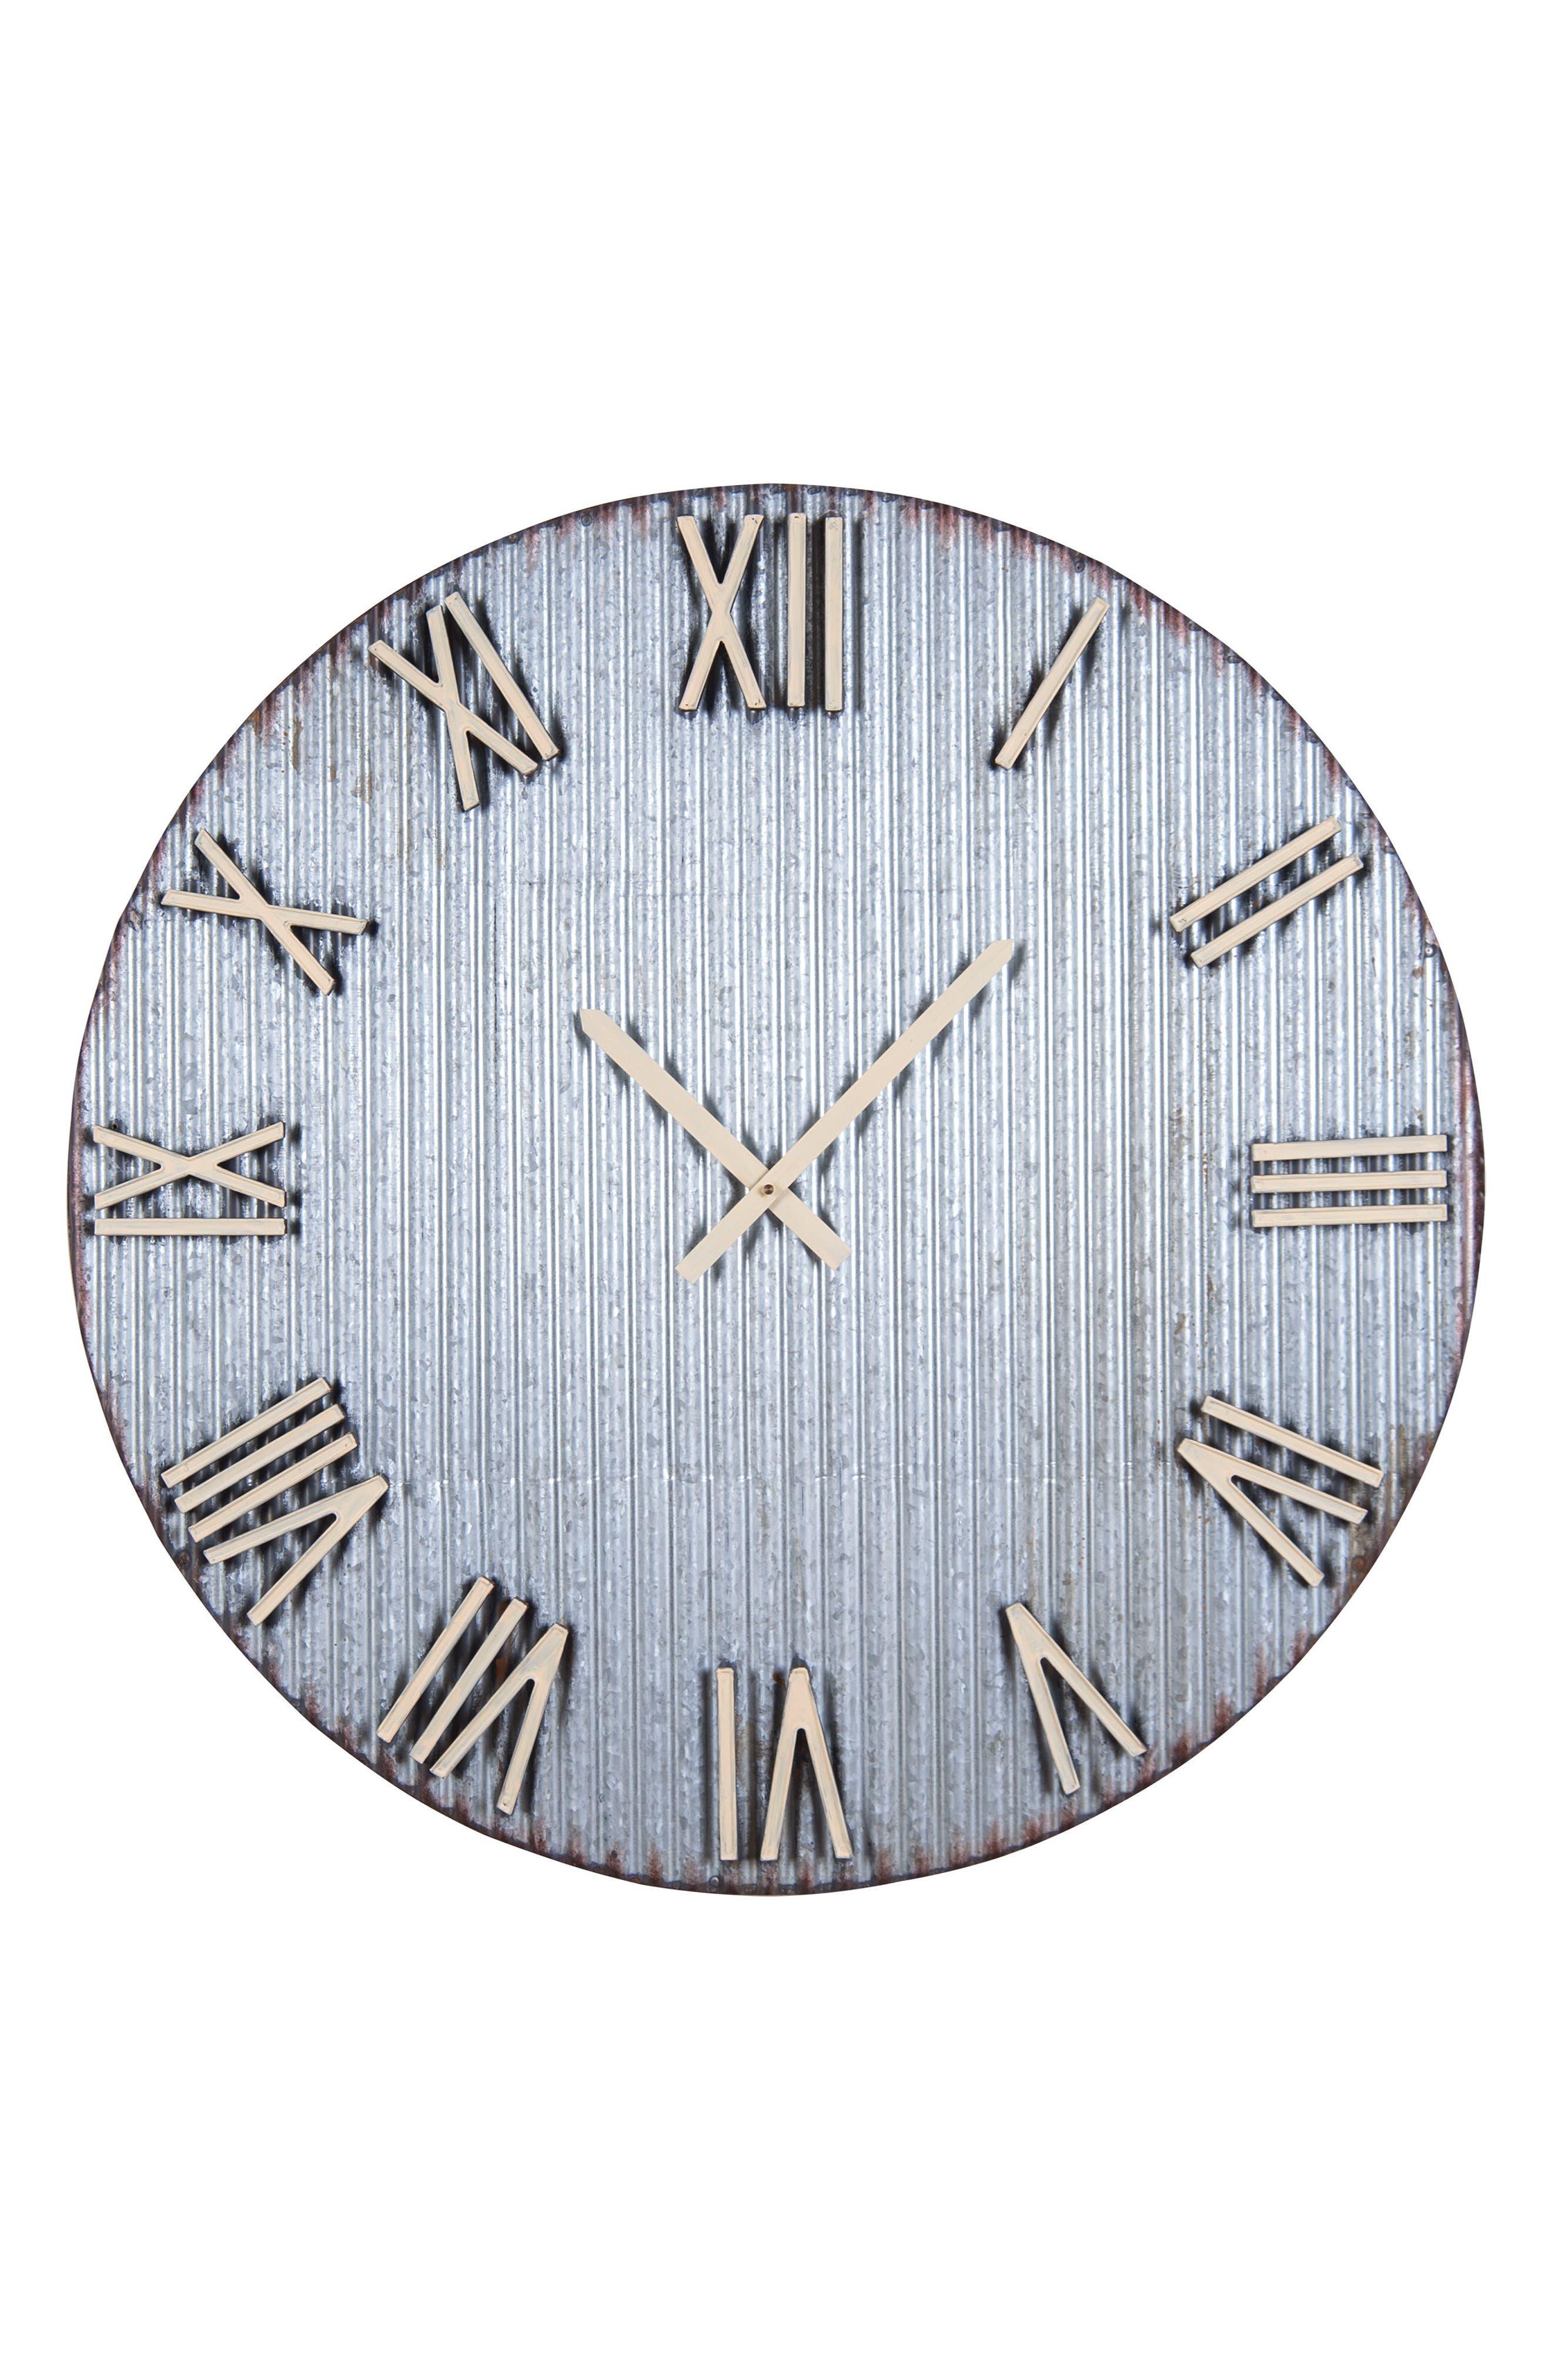 Farmers Corrugated Metal Wall Clock,                             Main thumbnail 1, color,                             040